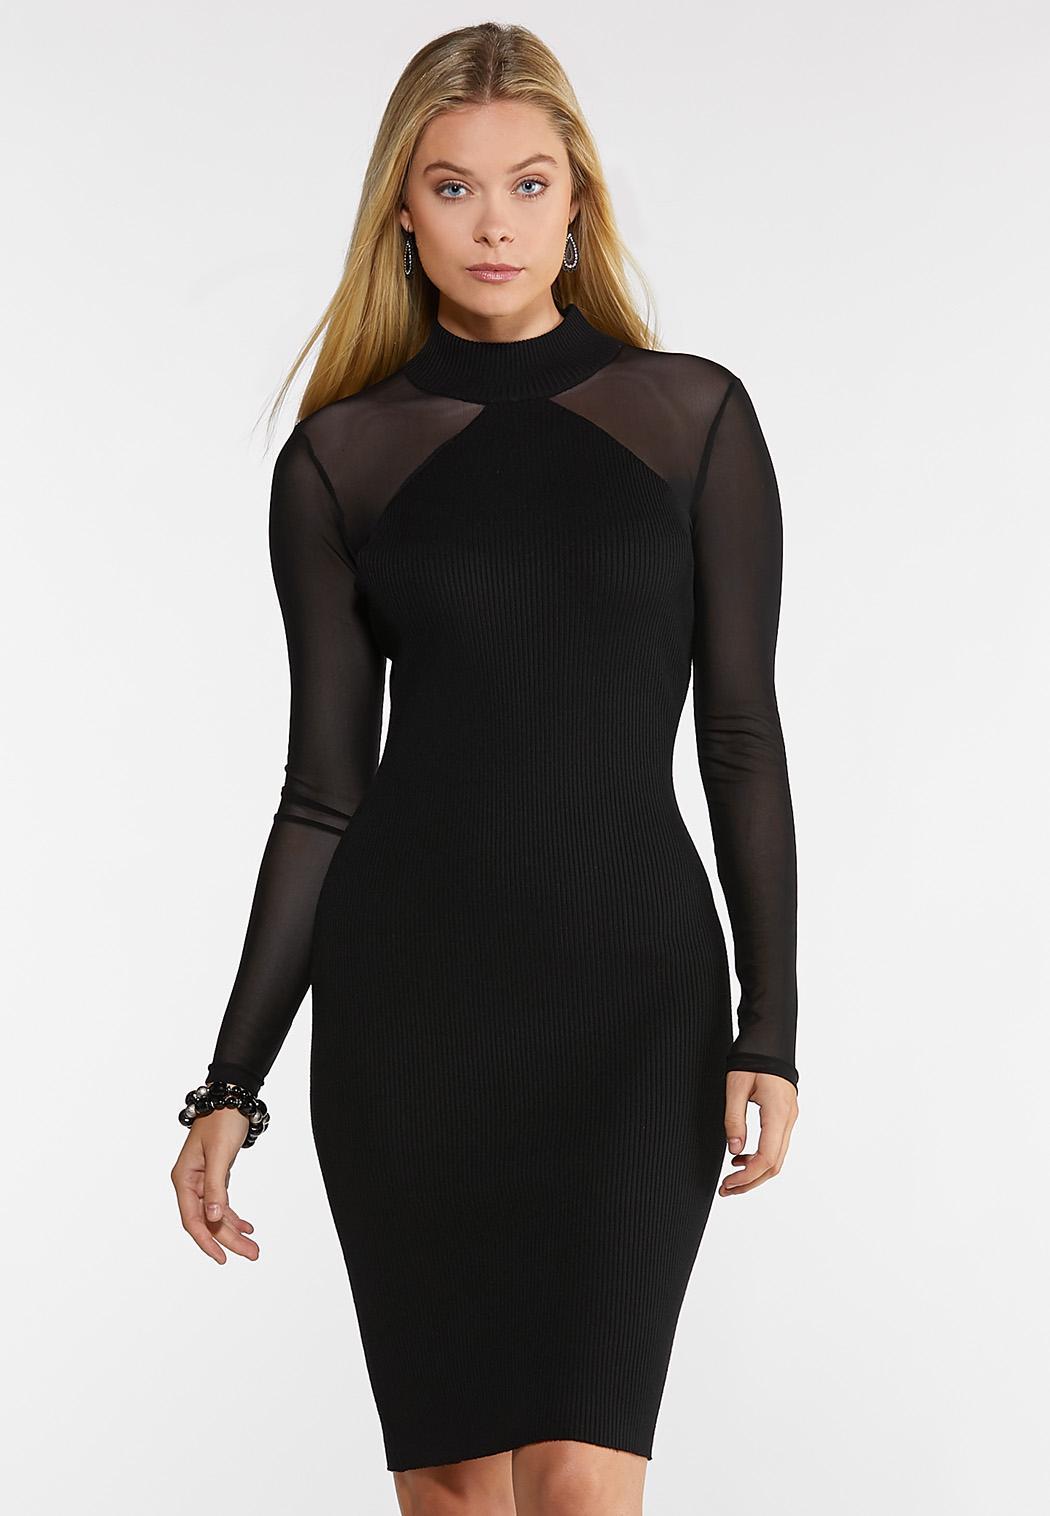 Illusion Sleeve Sweater Dress